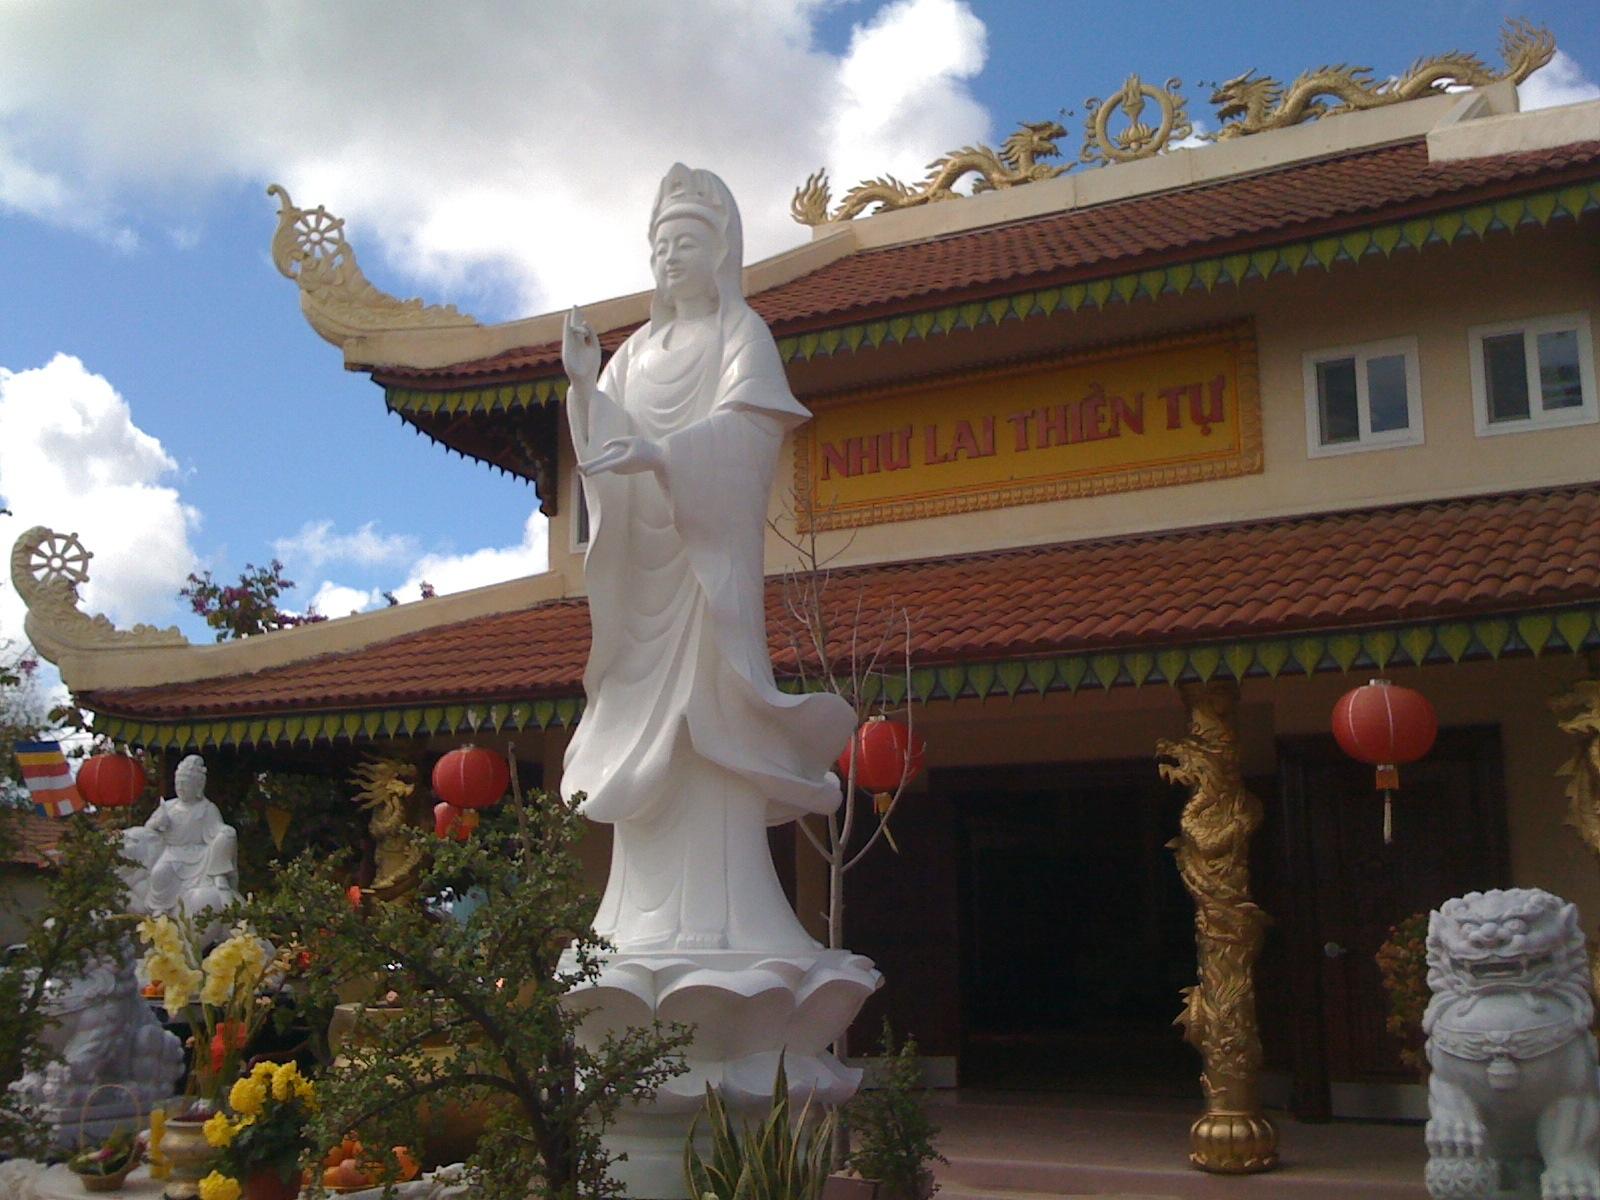 Nhu Lai Thien Tu